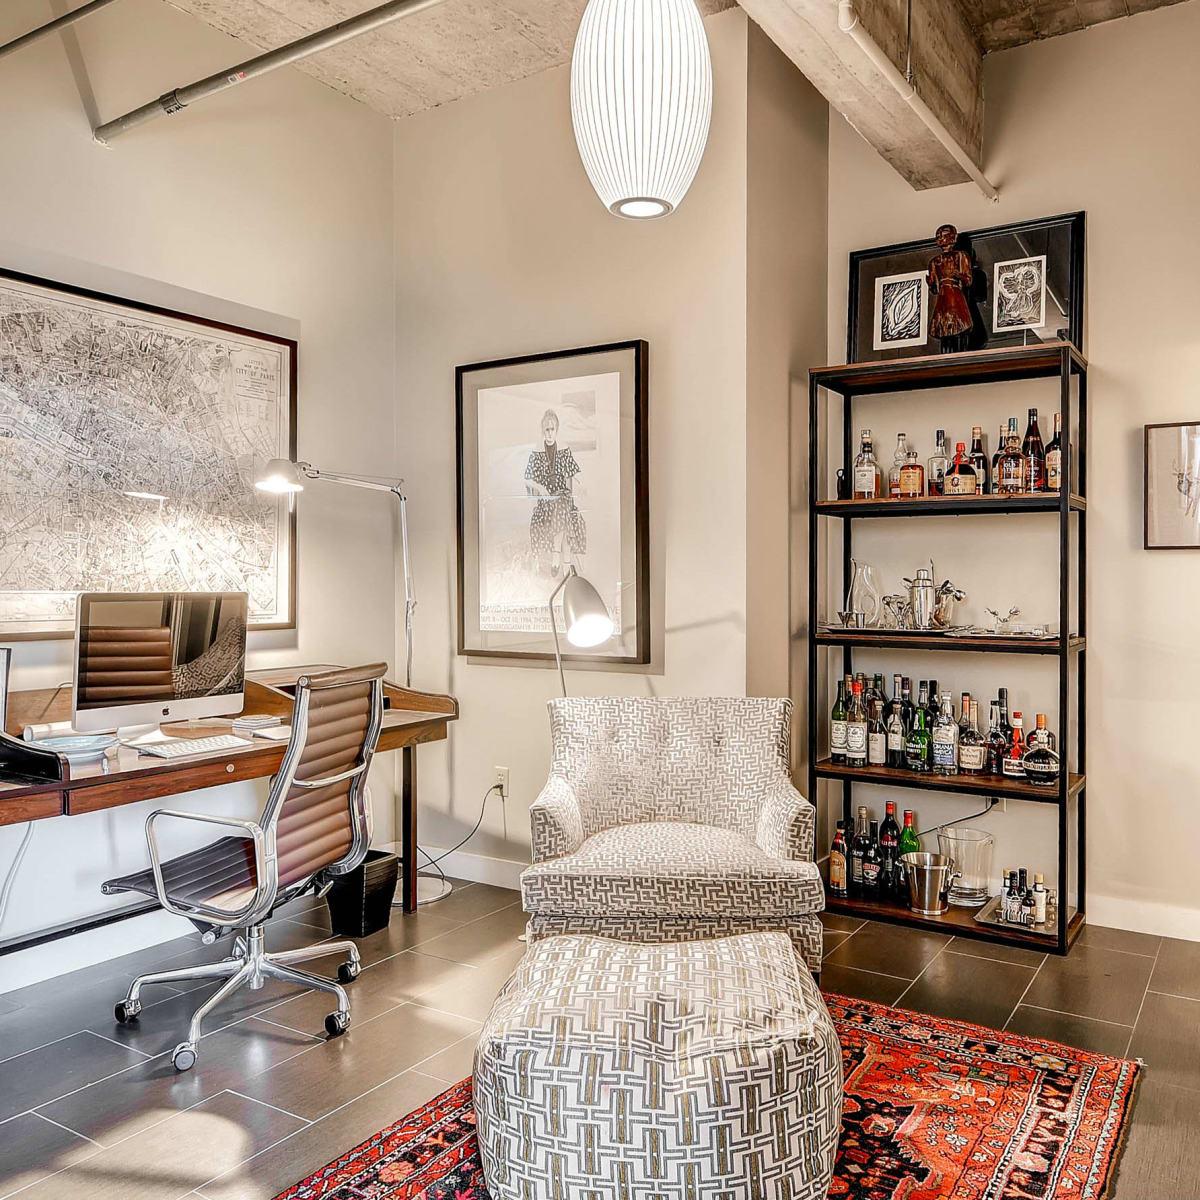 710 Colorado St. condo for sale